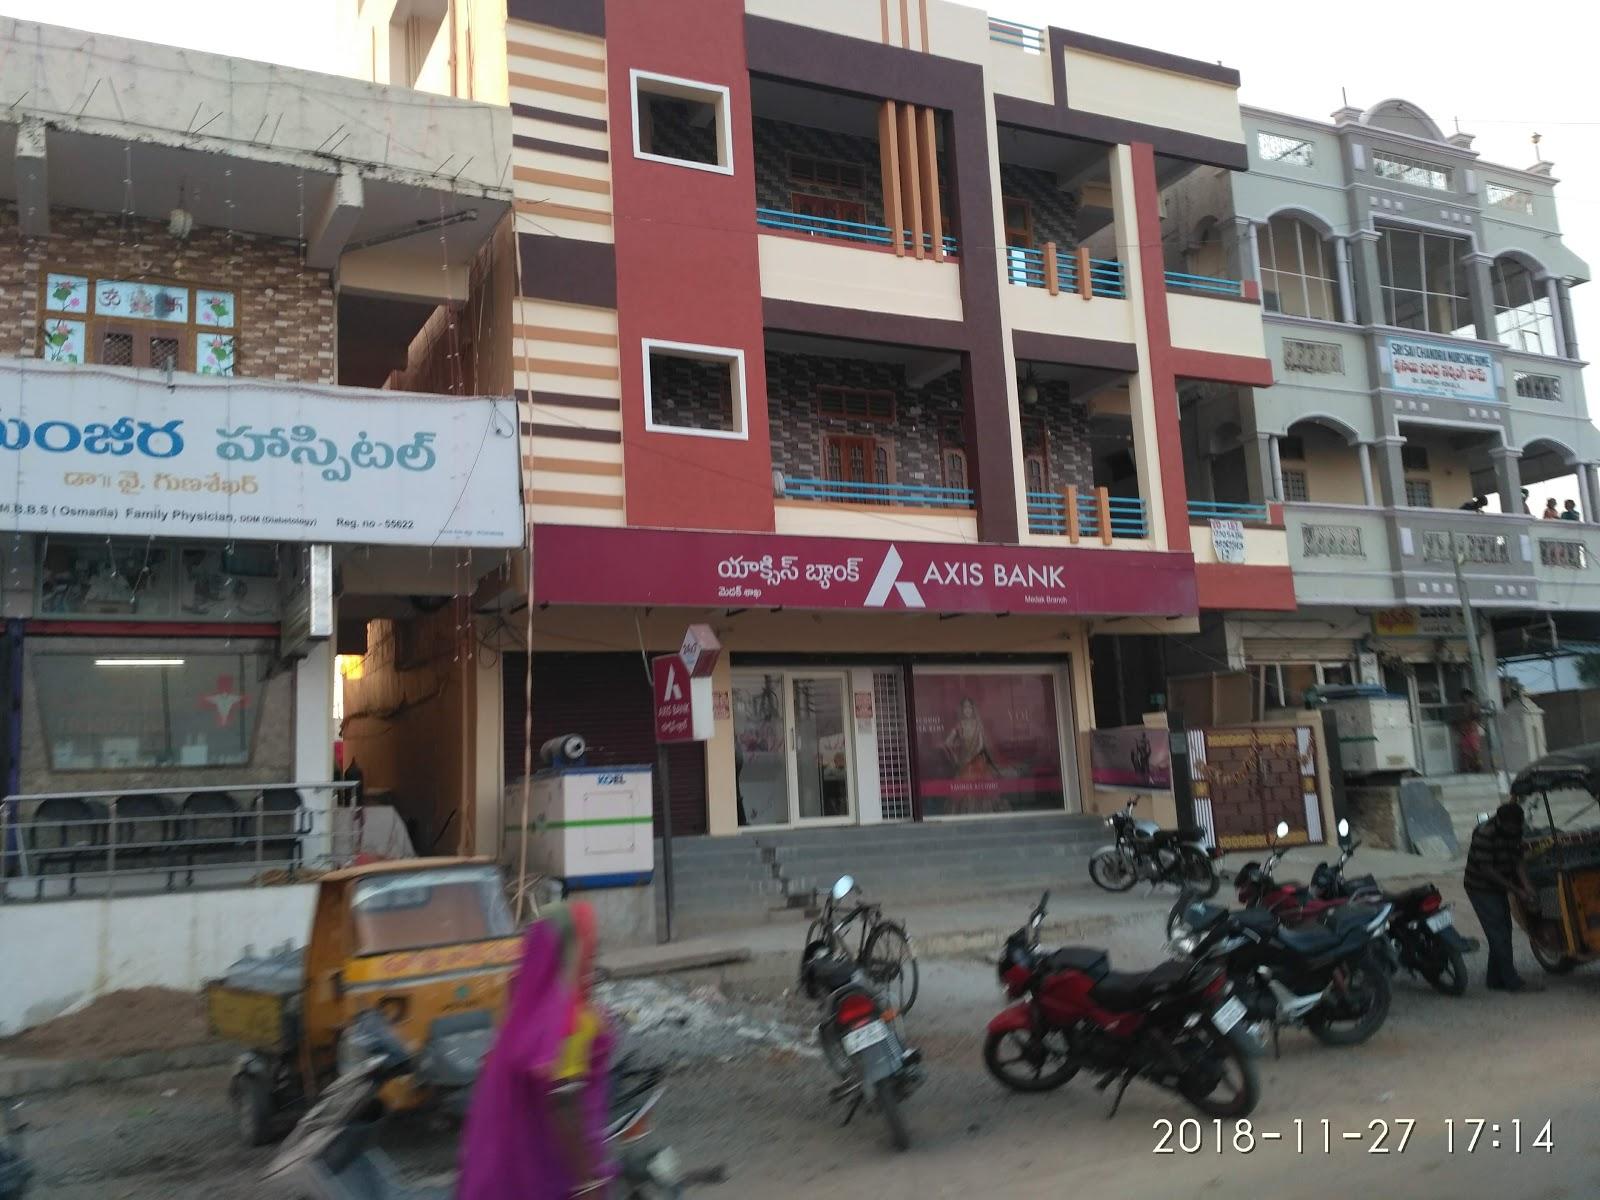 blood bank Axis Bank near Medak U Telangana